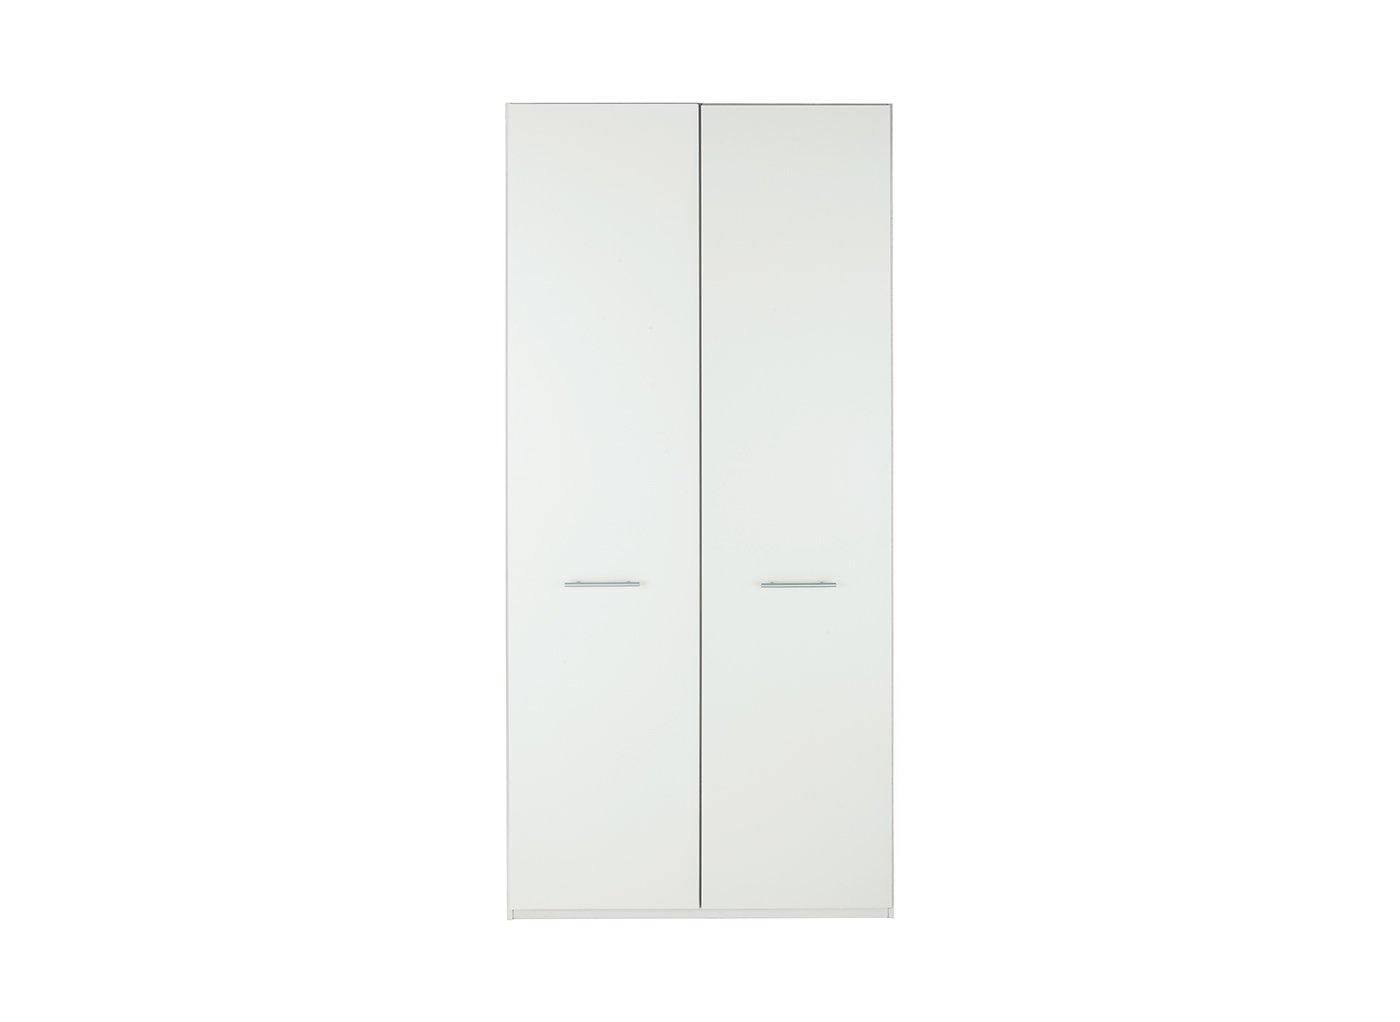 Samara 2 Door Wardrobe - White